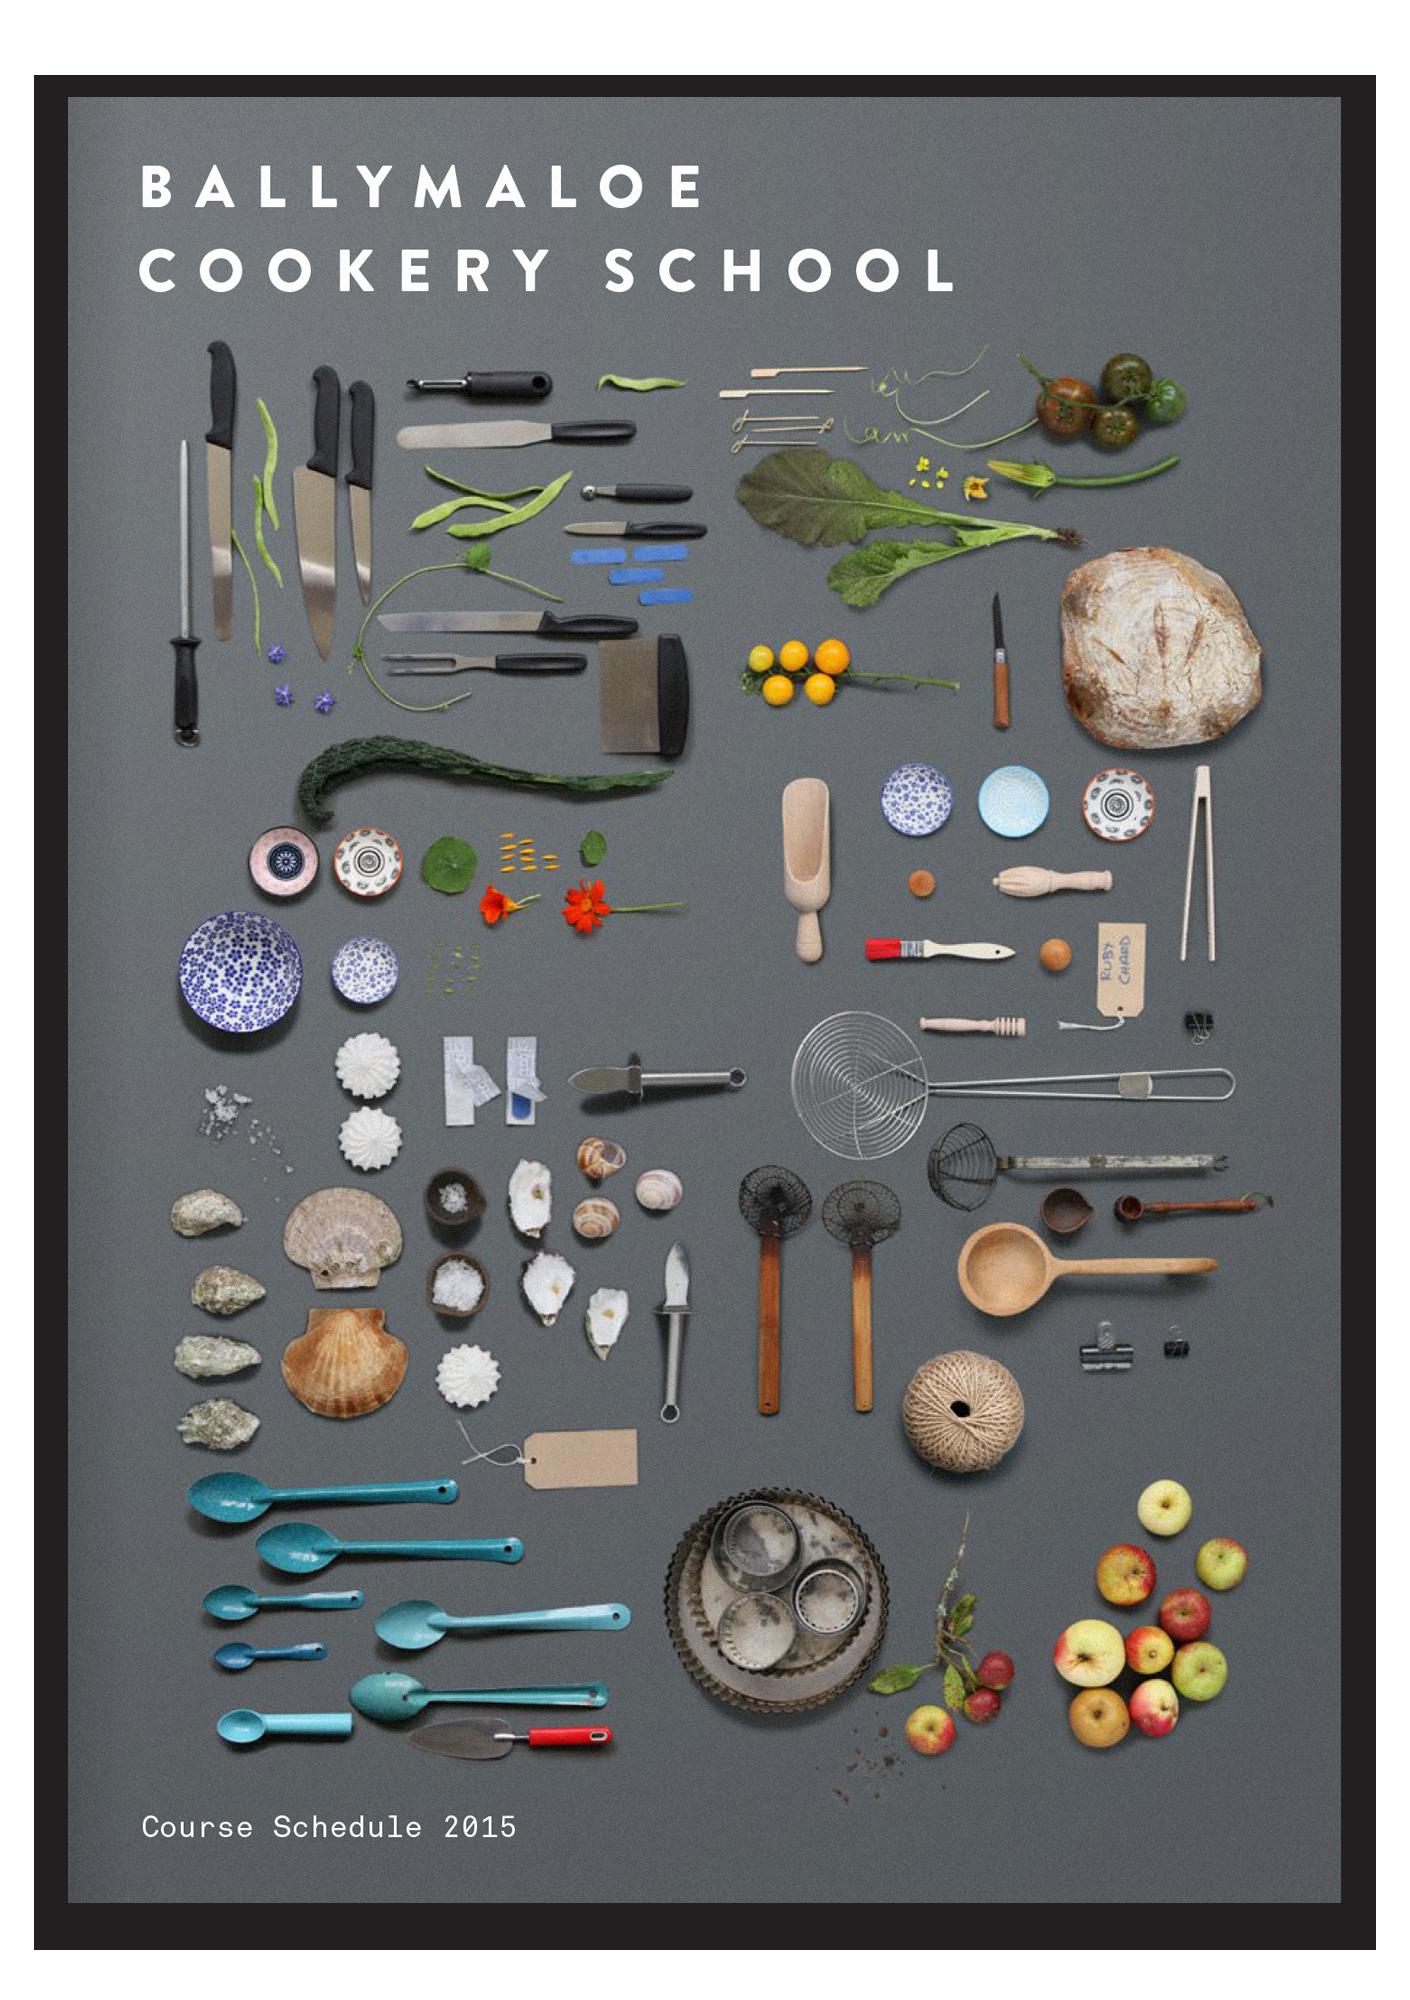 Cover image: Ballymaloe Cookery School